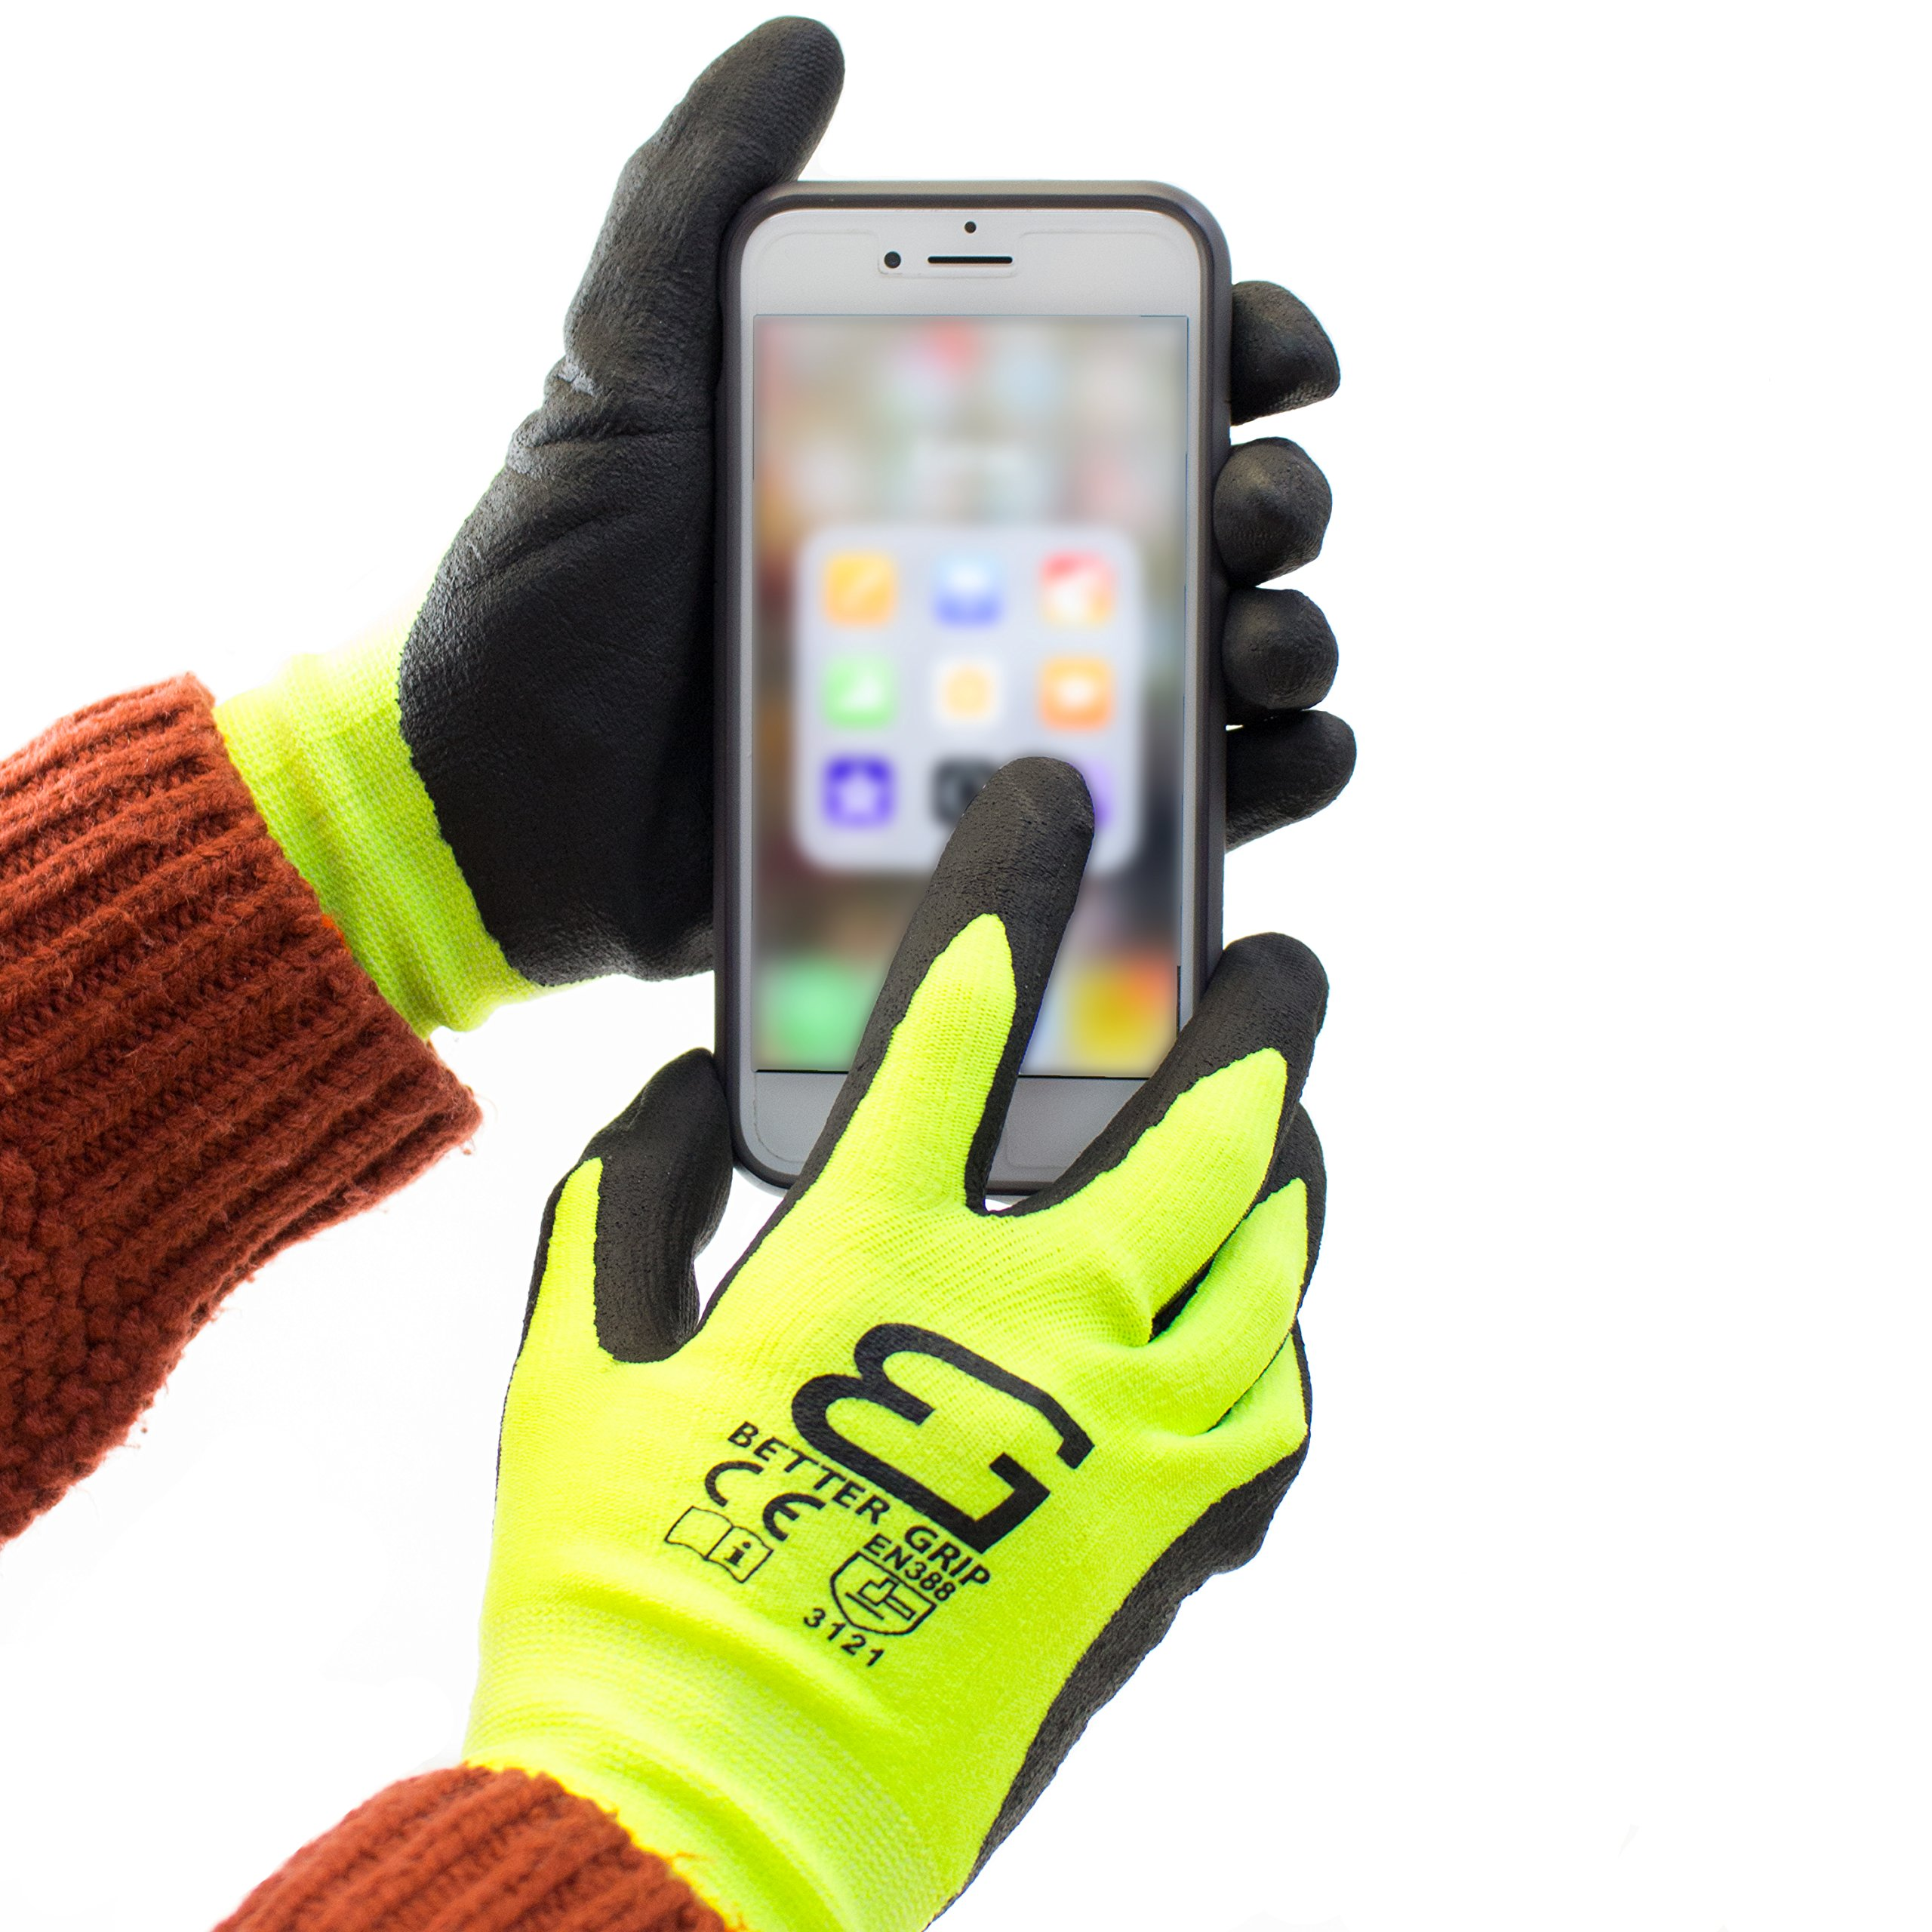 Spidergard SPL-RR50 50 Foot Wire Rope Self-Retracting Lifeline with Swivel Hook and Carabiner w/ Micro Foam Work Glove by Spidergard (Image #9)